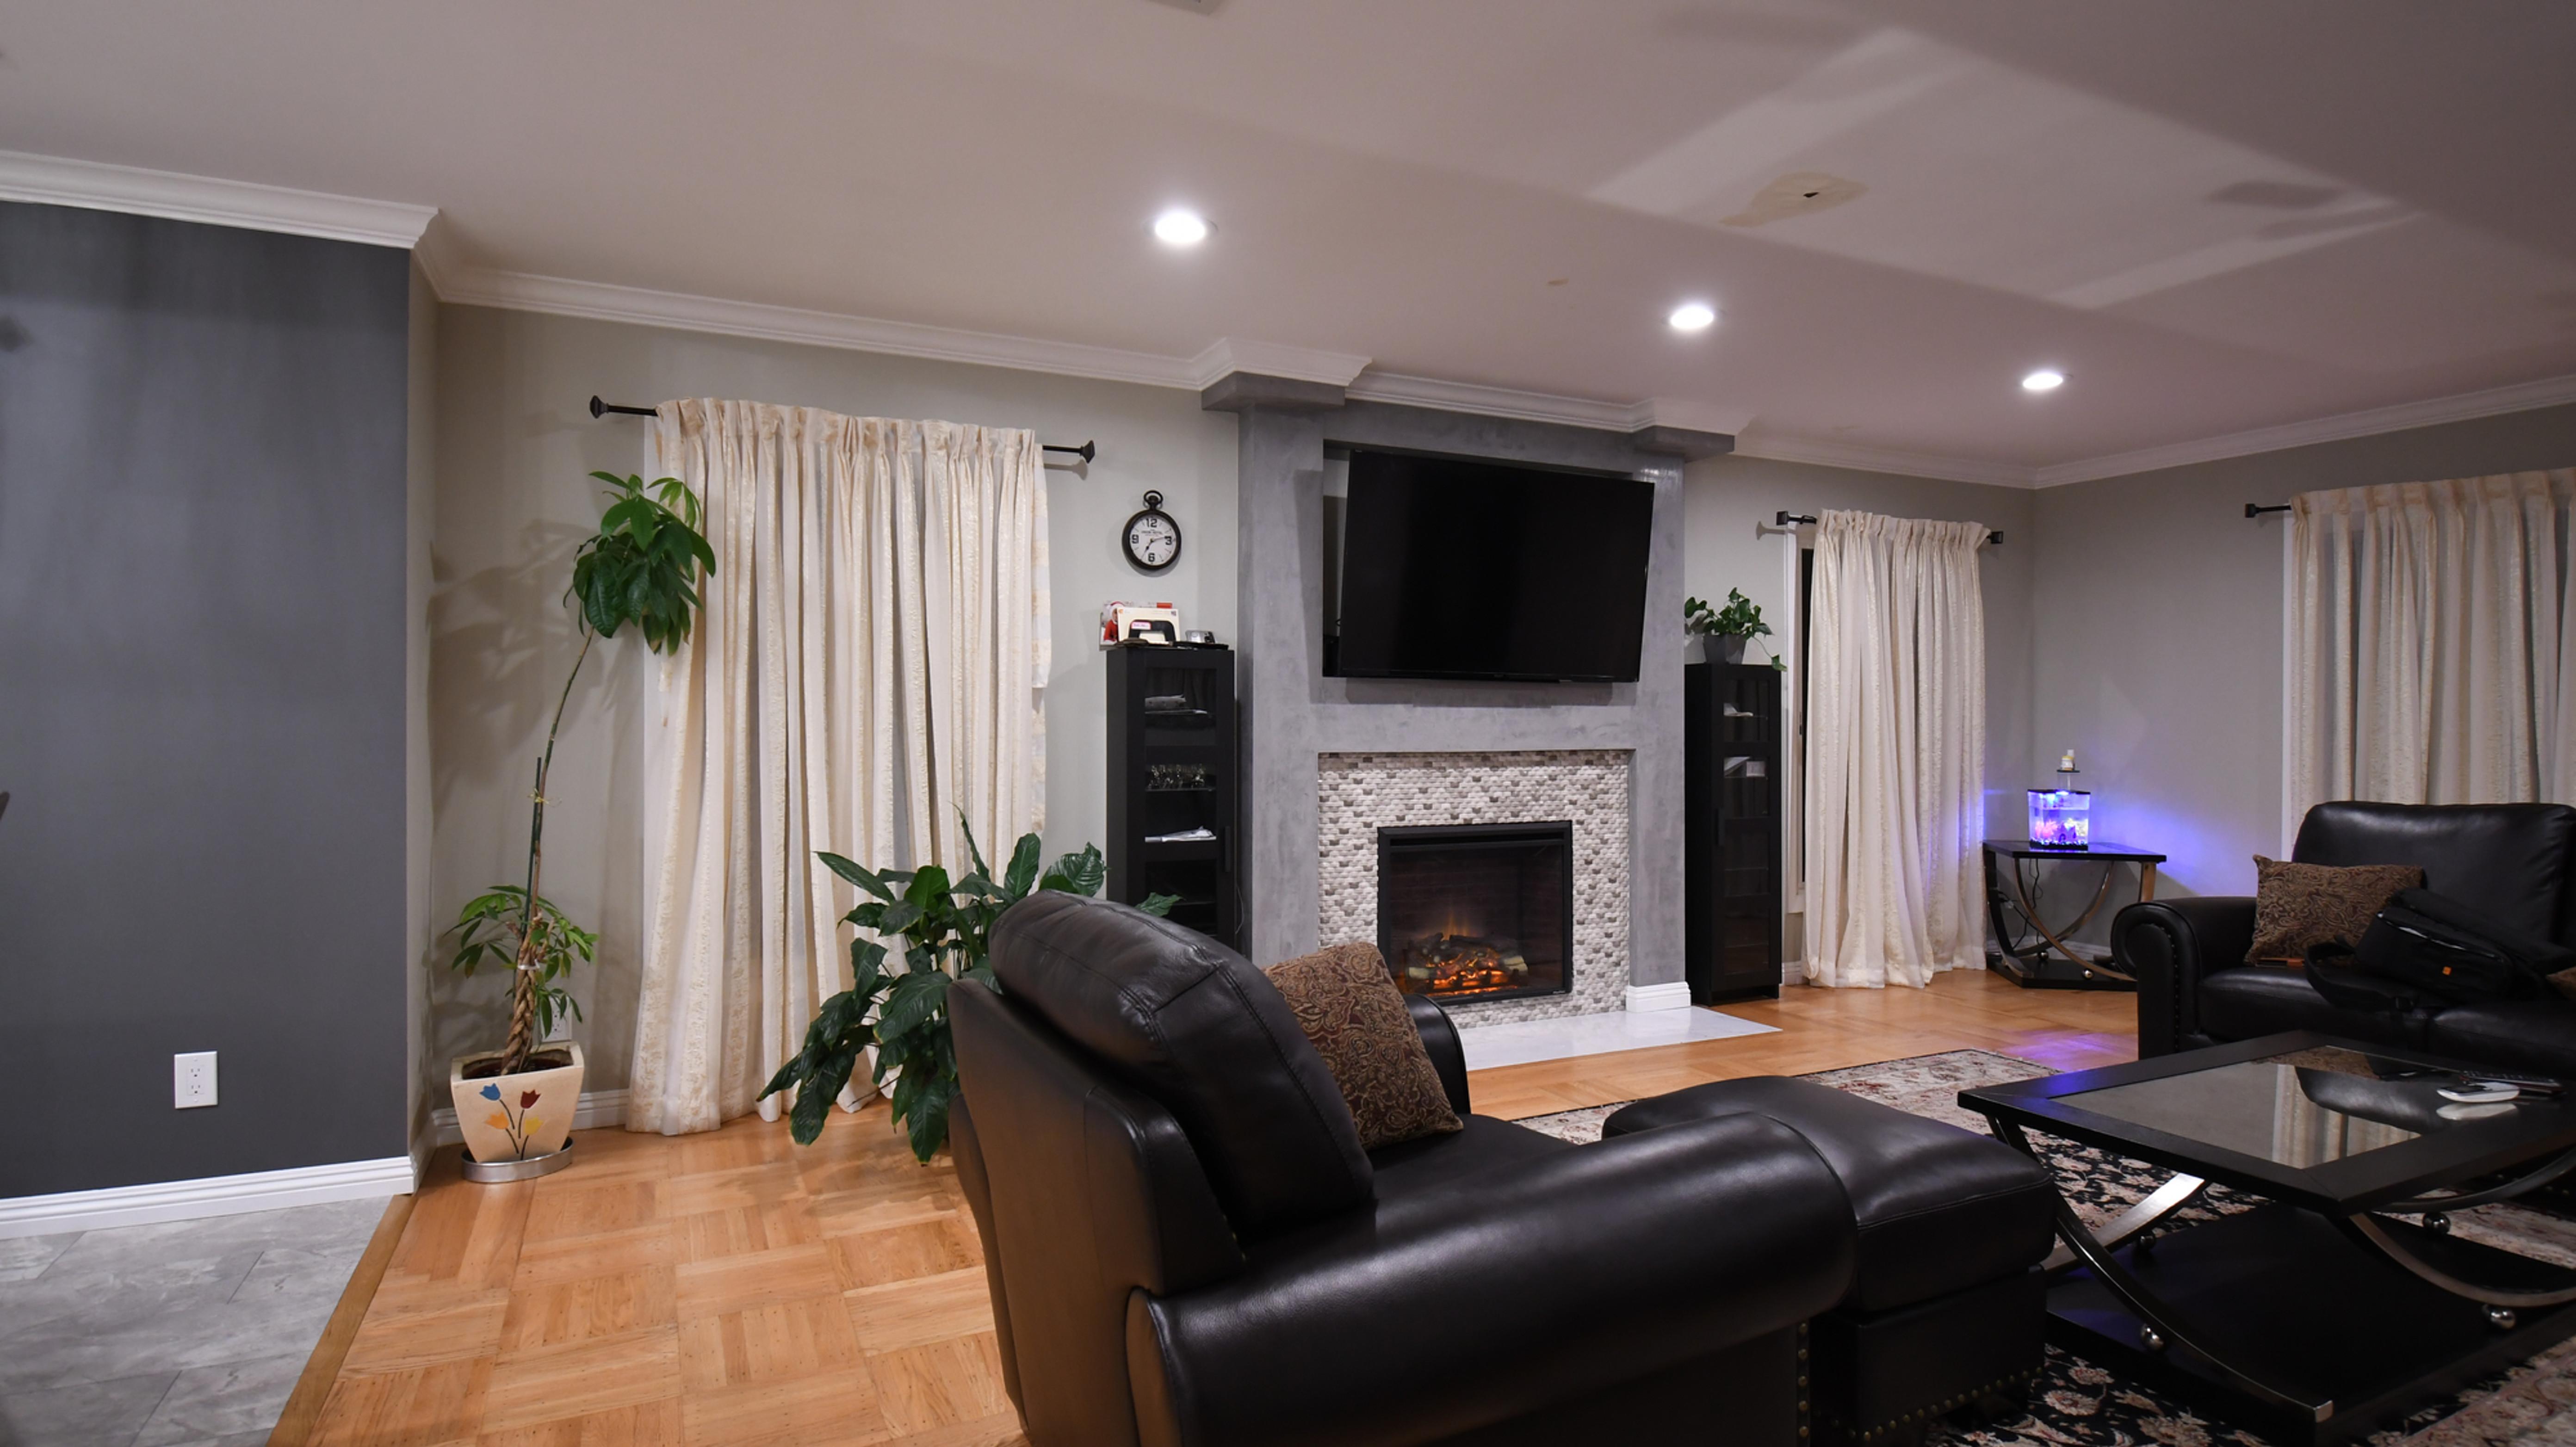 Major Room Remodel